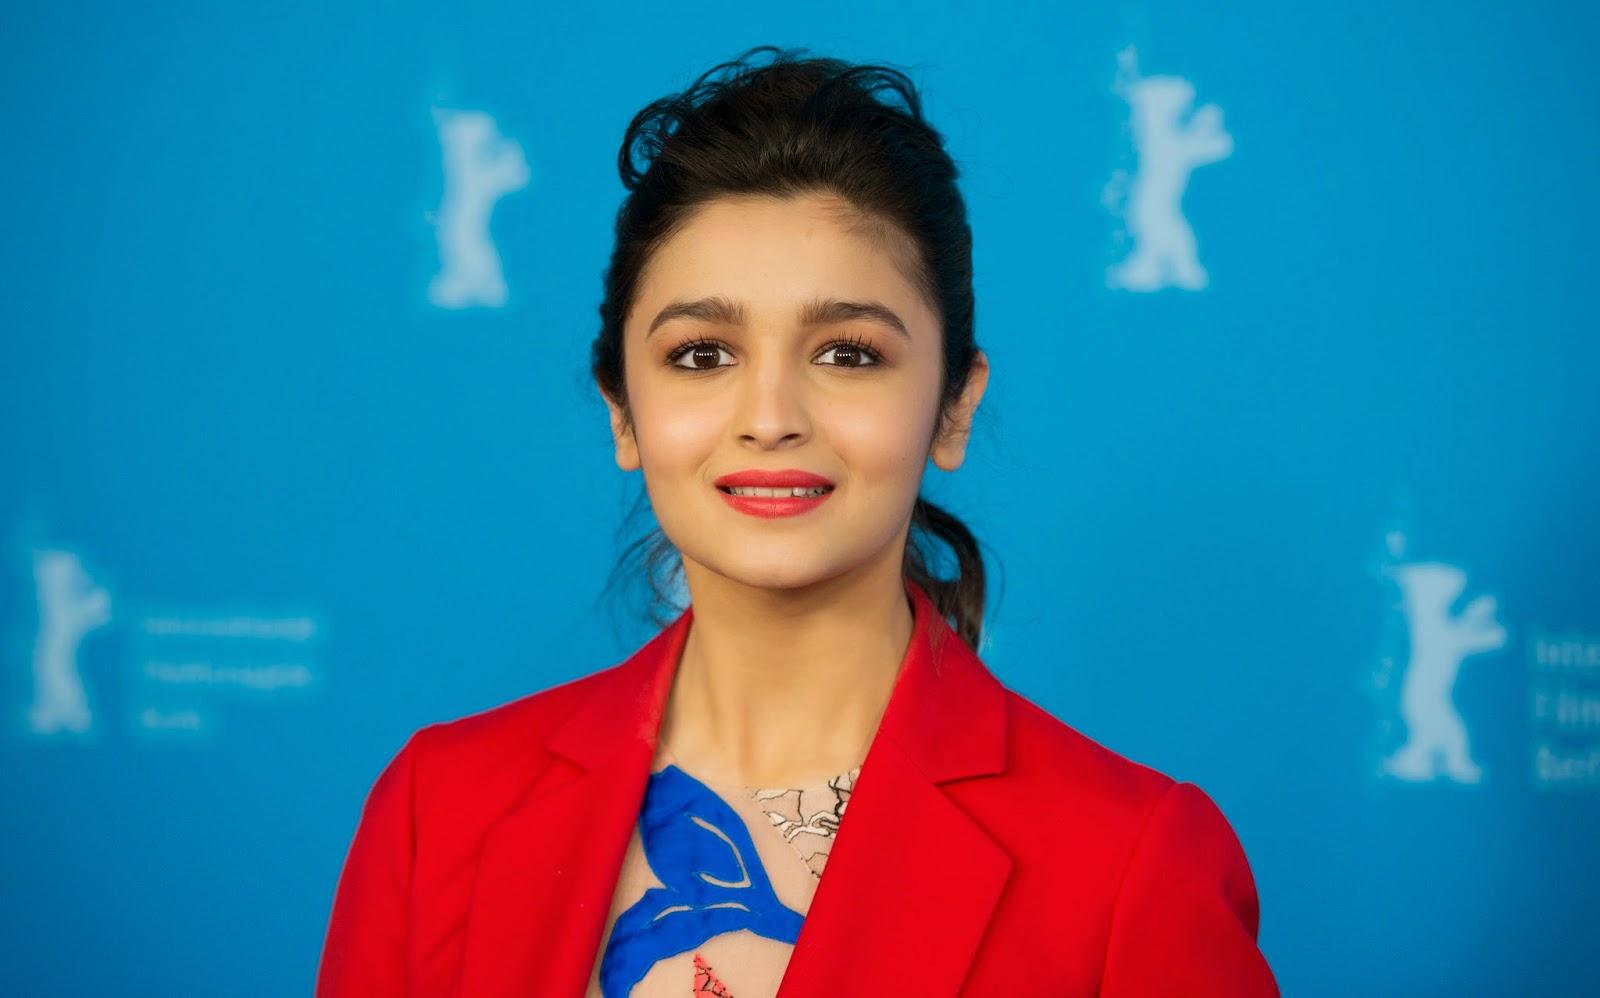 Alia Bhatt HD Pictures | Alia Bhatt HD Wallpapers